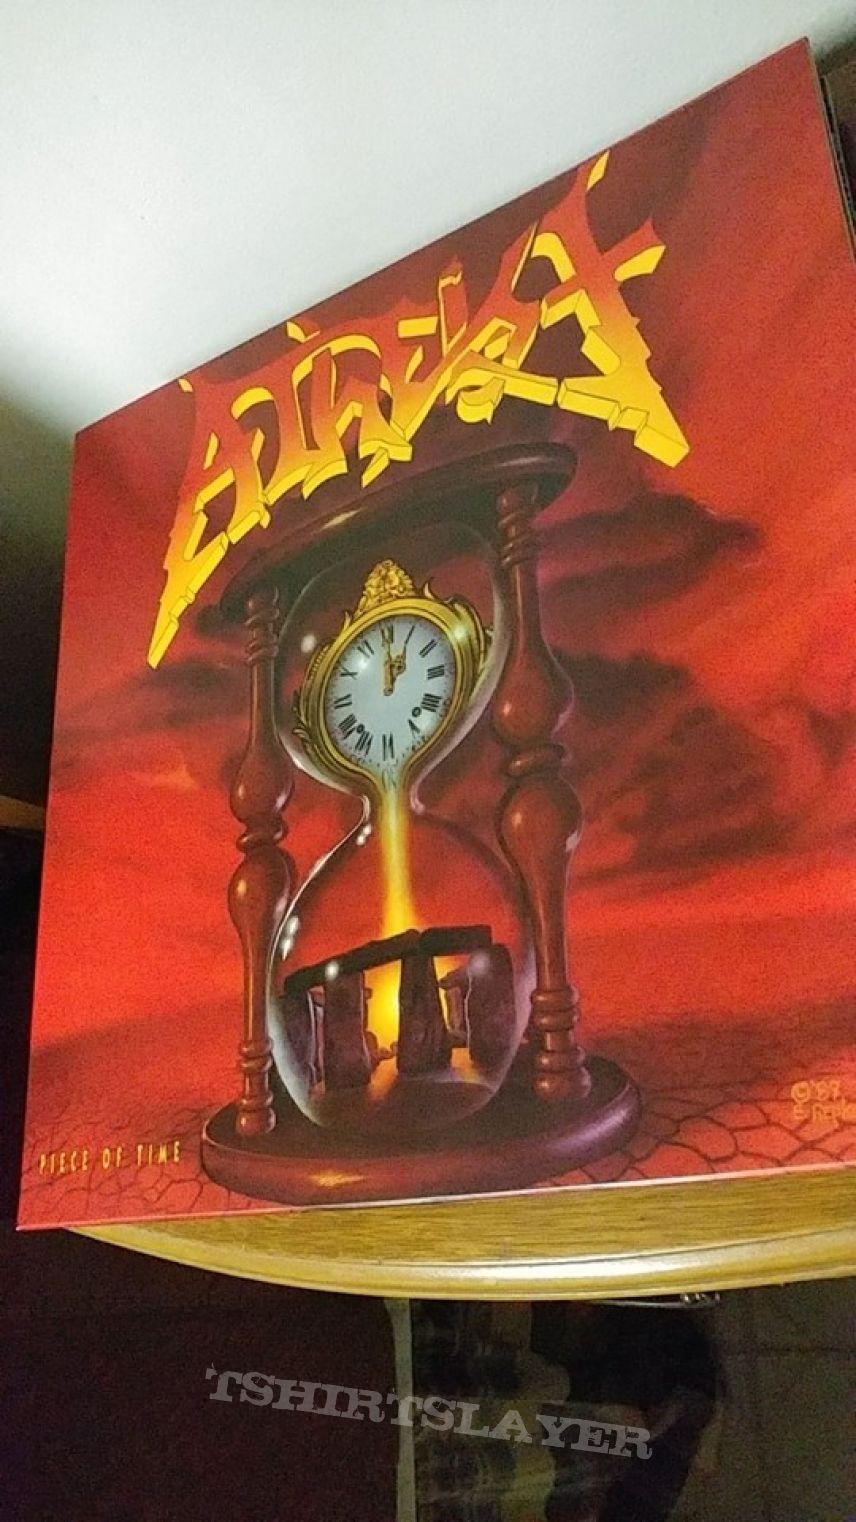 Piece of Time Vinyl